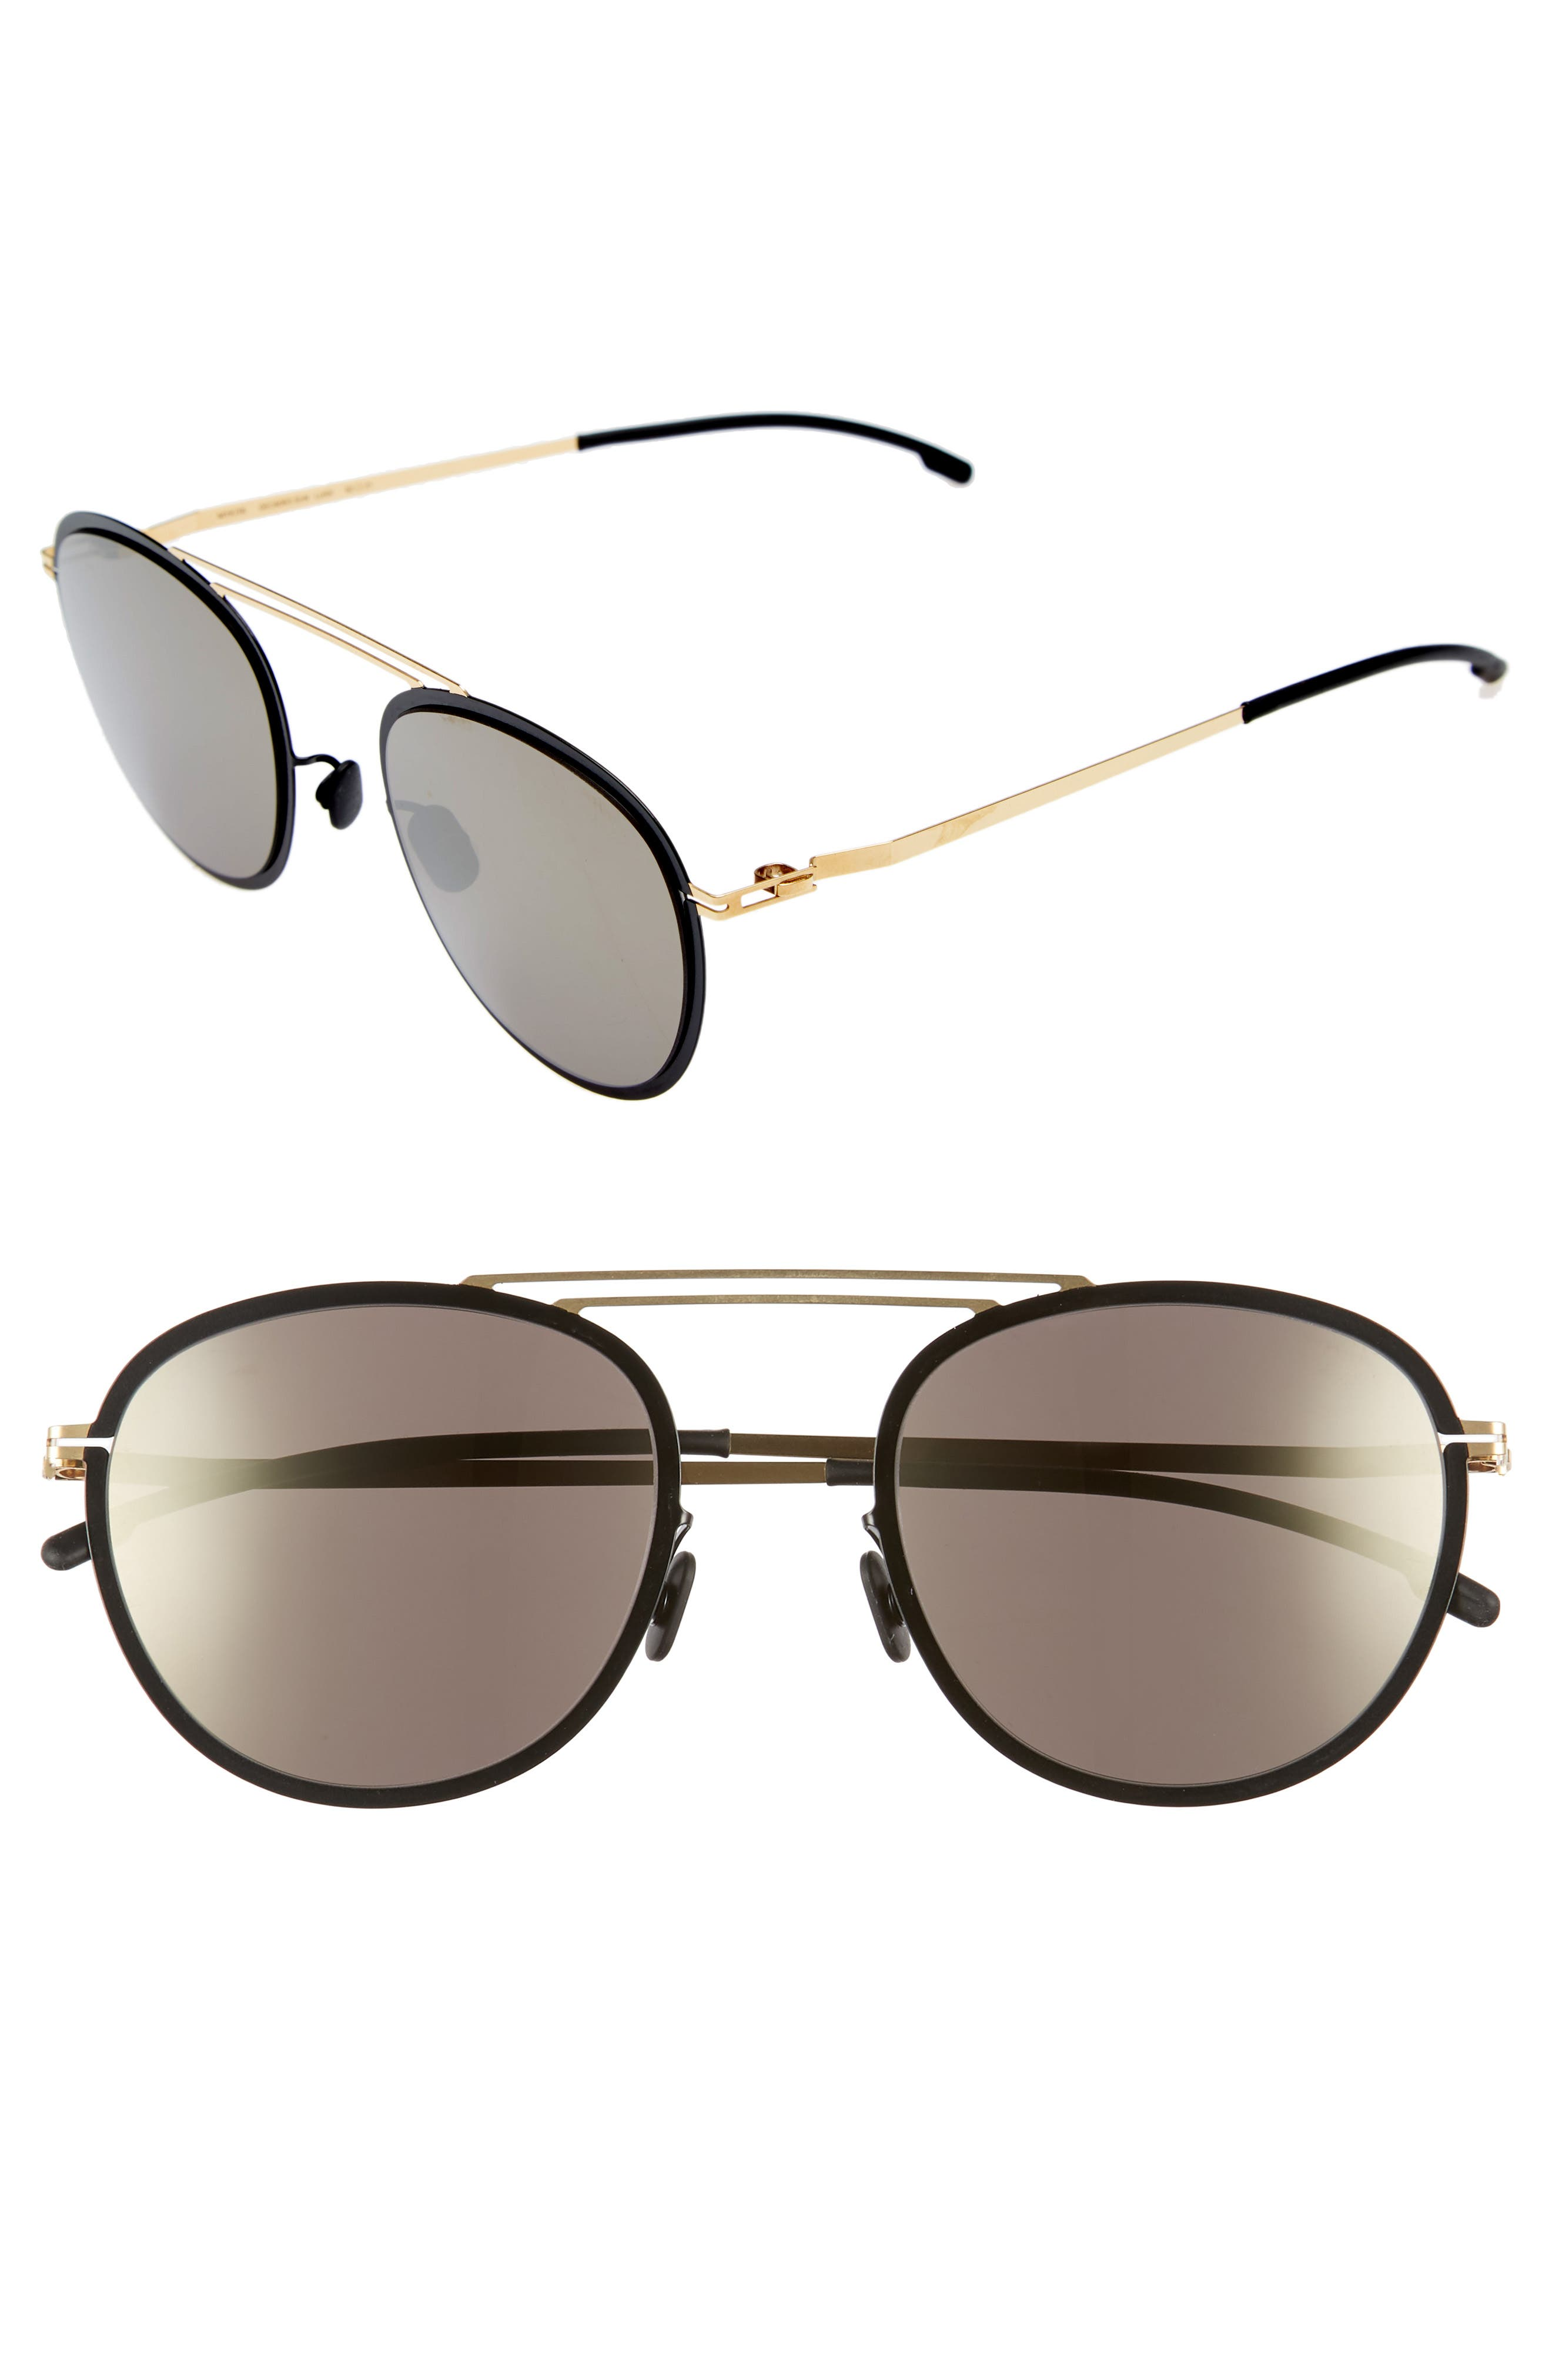 Luigi 52mm Aviator Sunglasses,                             Main thumbnail 1, color,